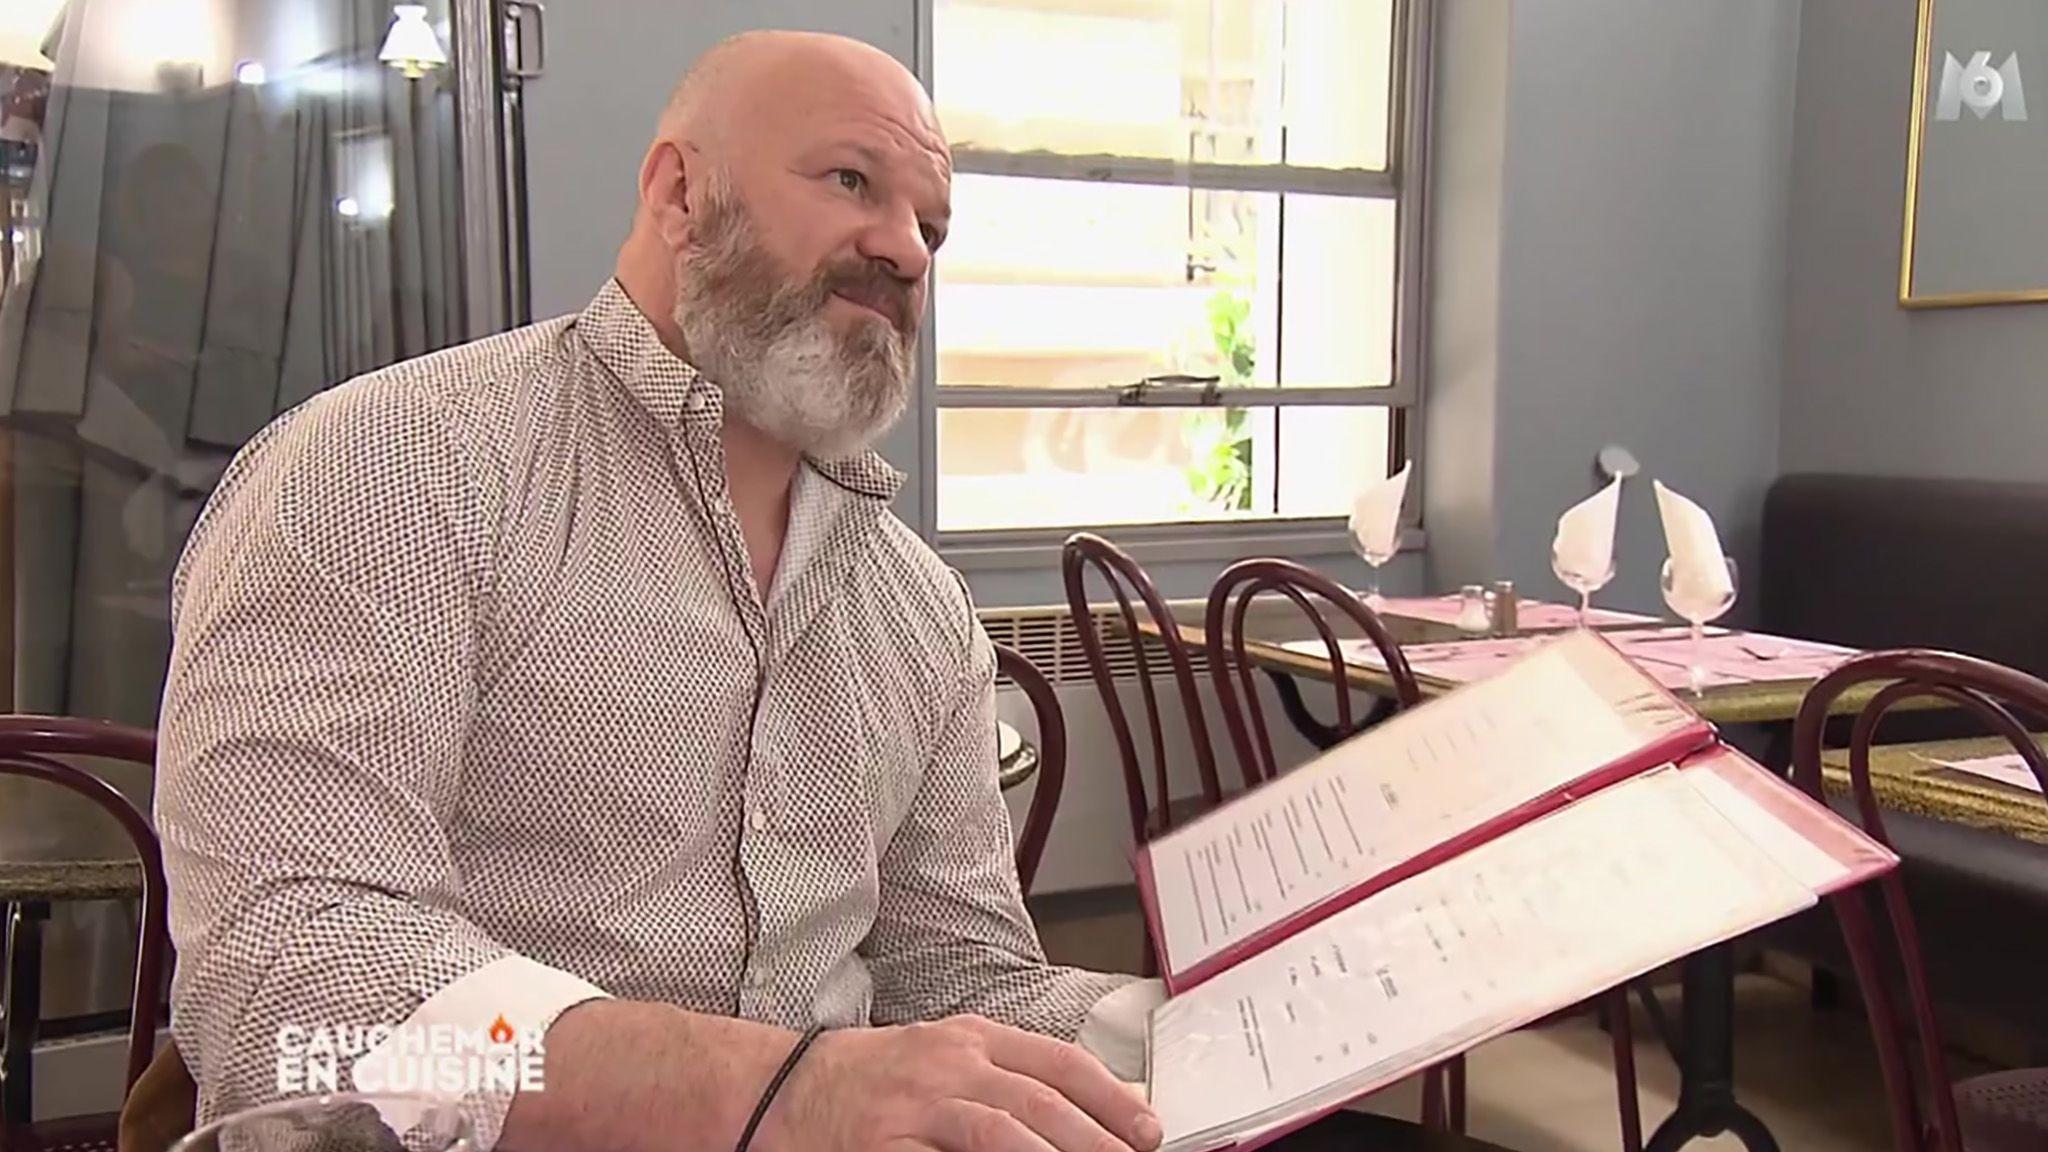 Cauchemar En Cuisine Ramsay Streaming Nouveau Collection 50 La Collection Cauchemar En Cuisine Nantes Plansmodernes Cauchemar